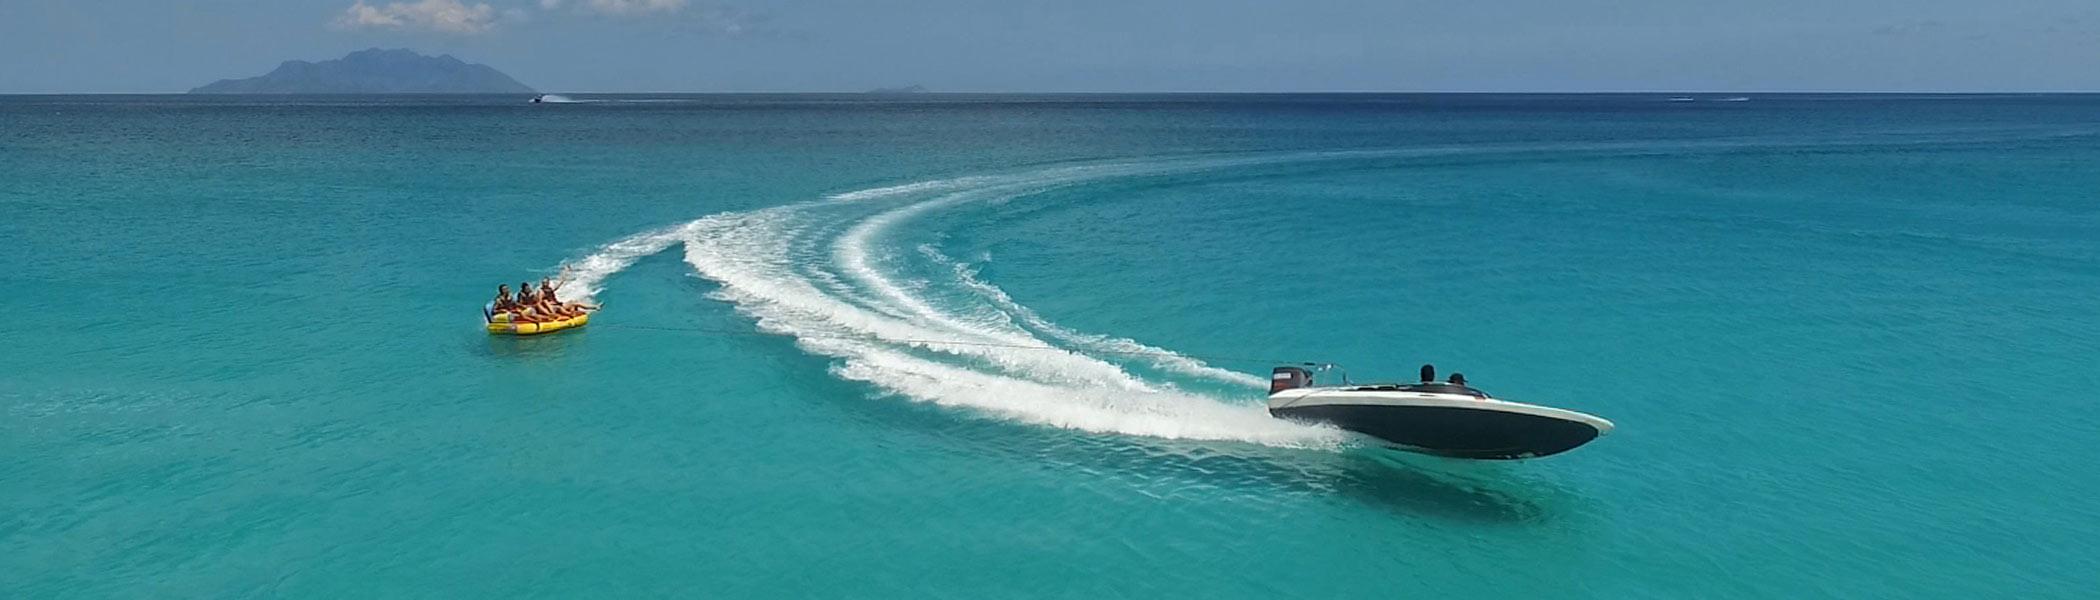 mamila-watersport, Watersports in Seychelles Islands